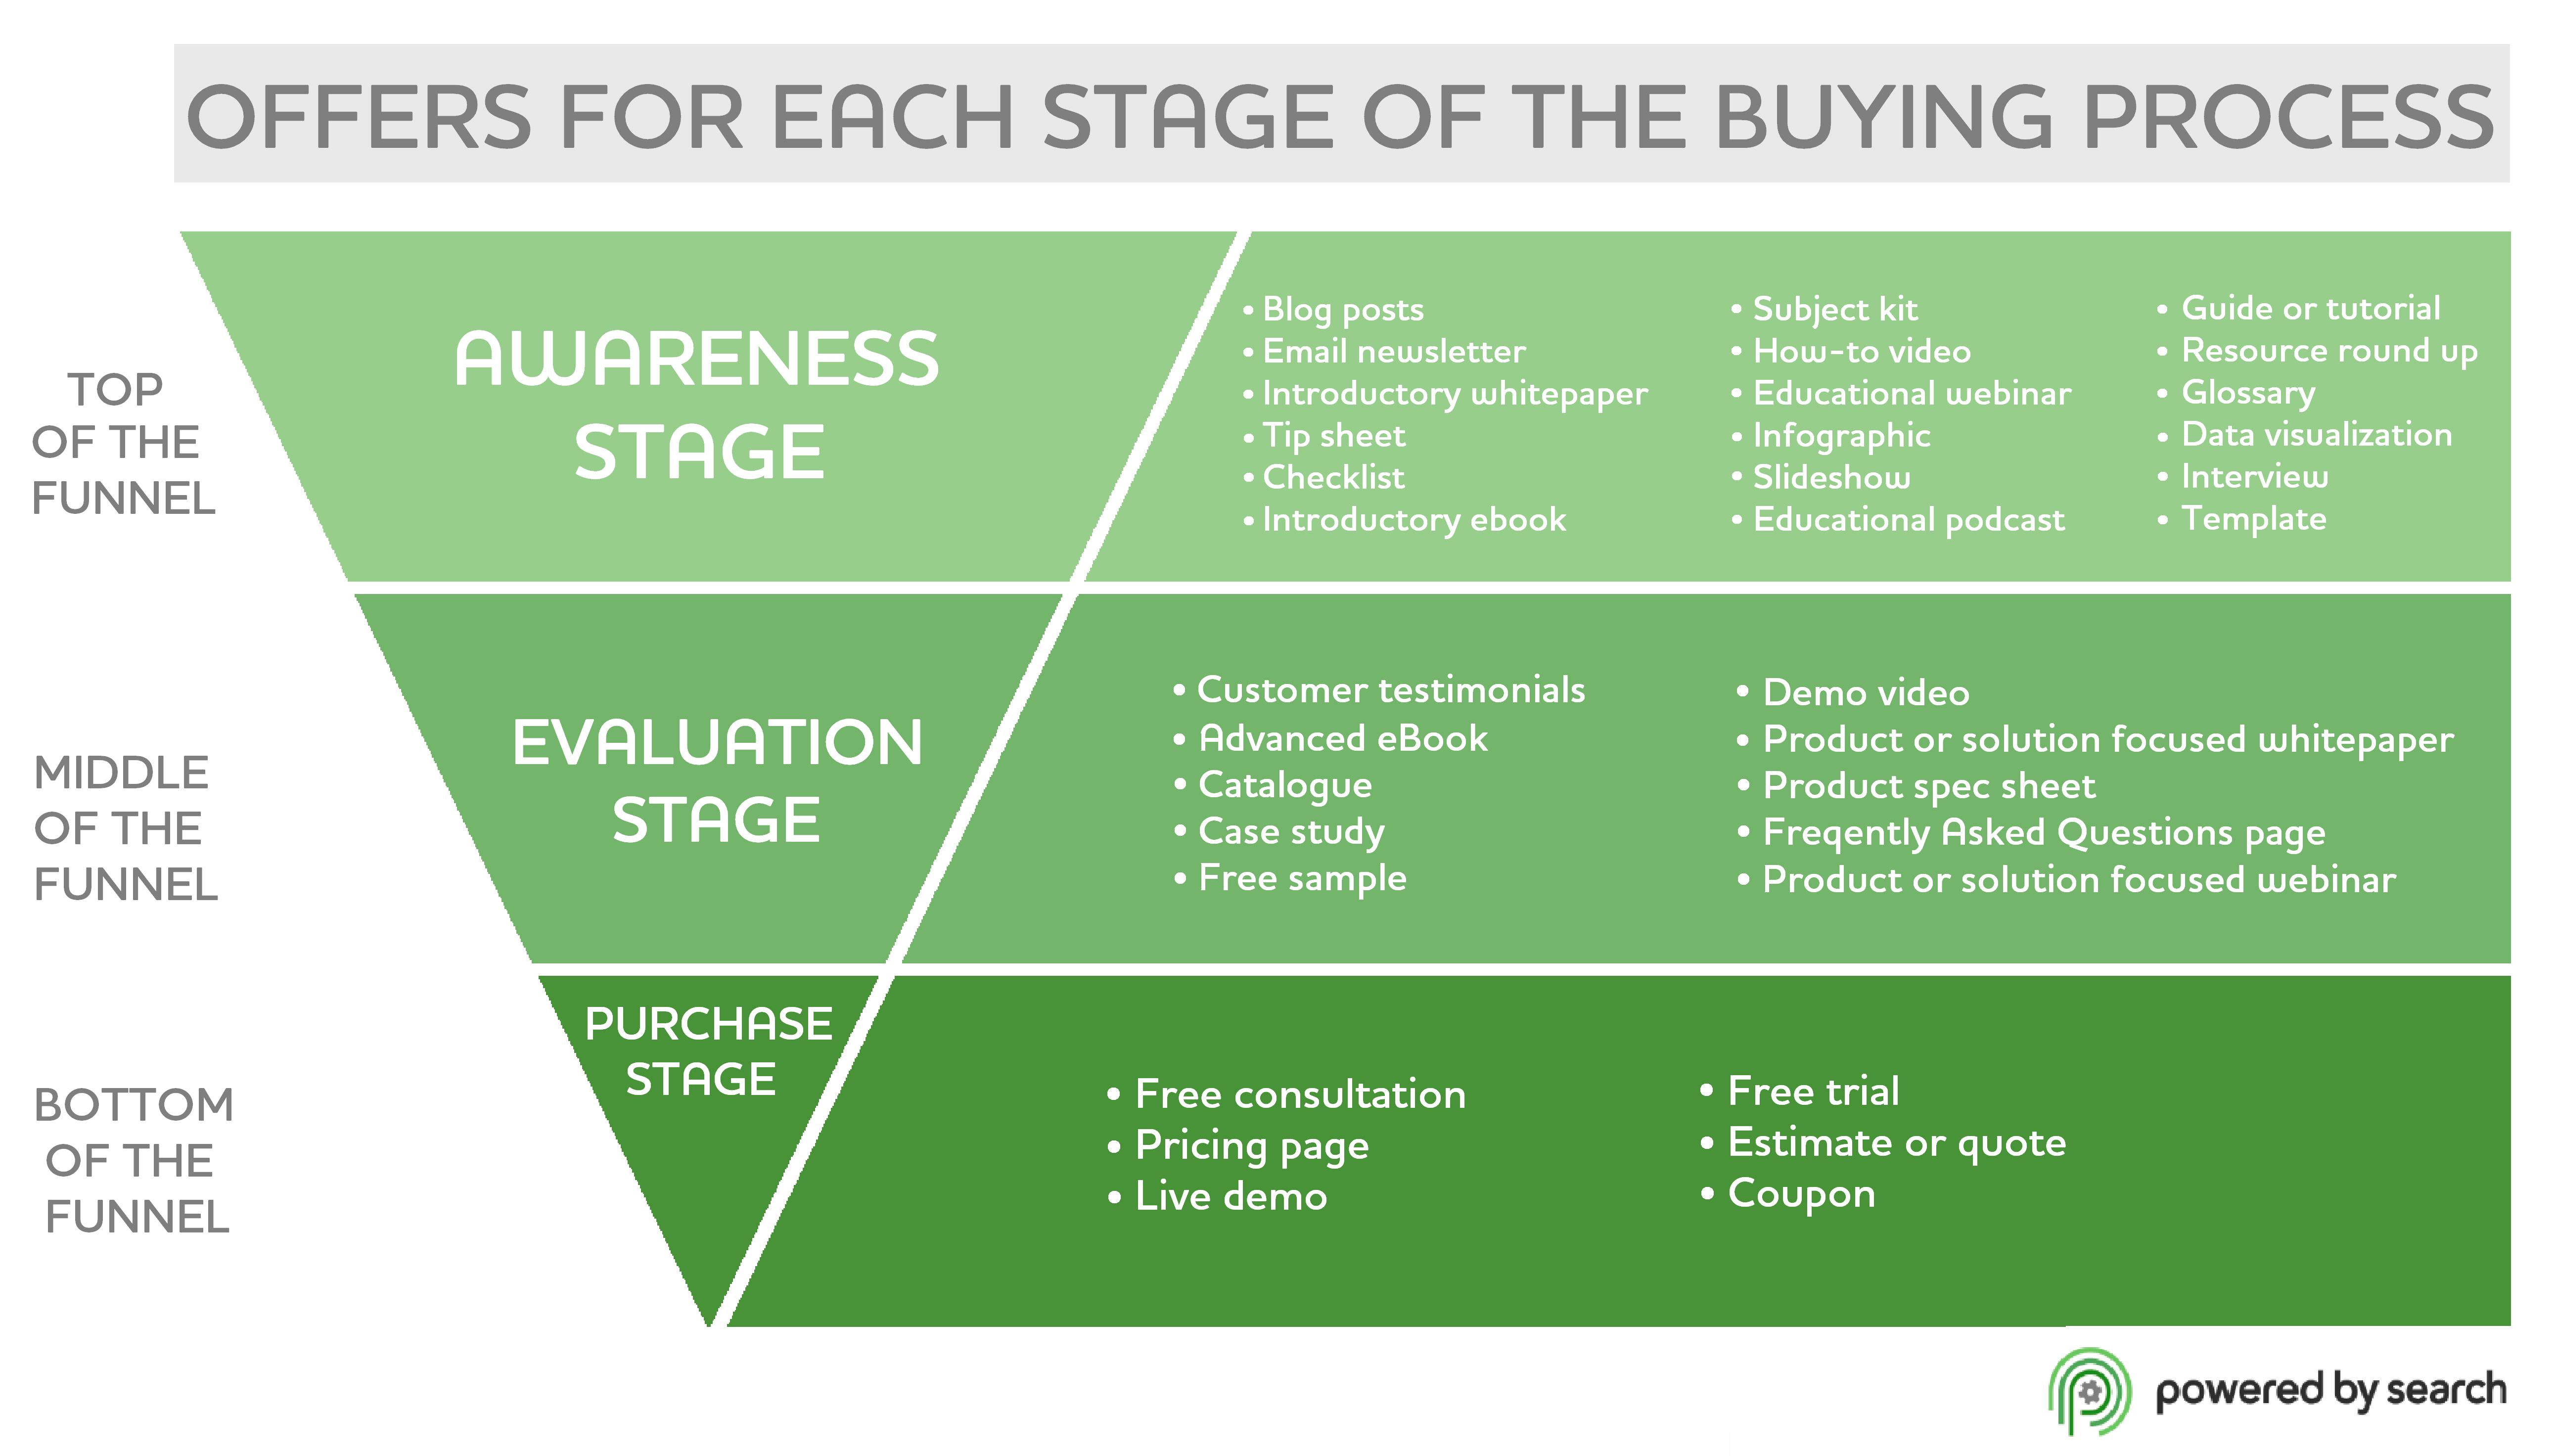 Stadia van aankoop proces